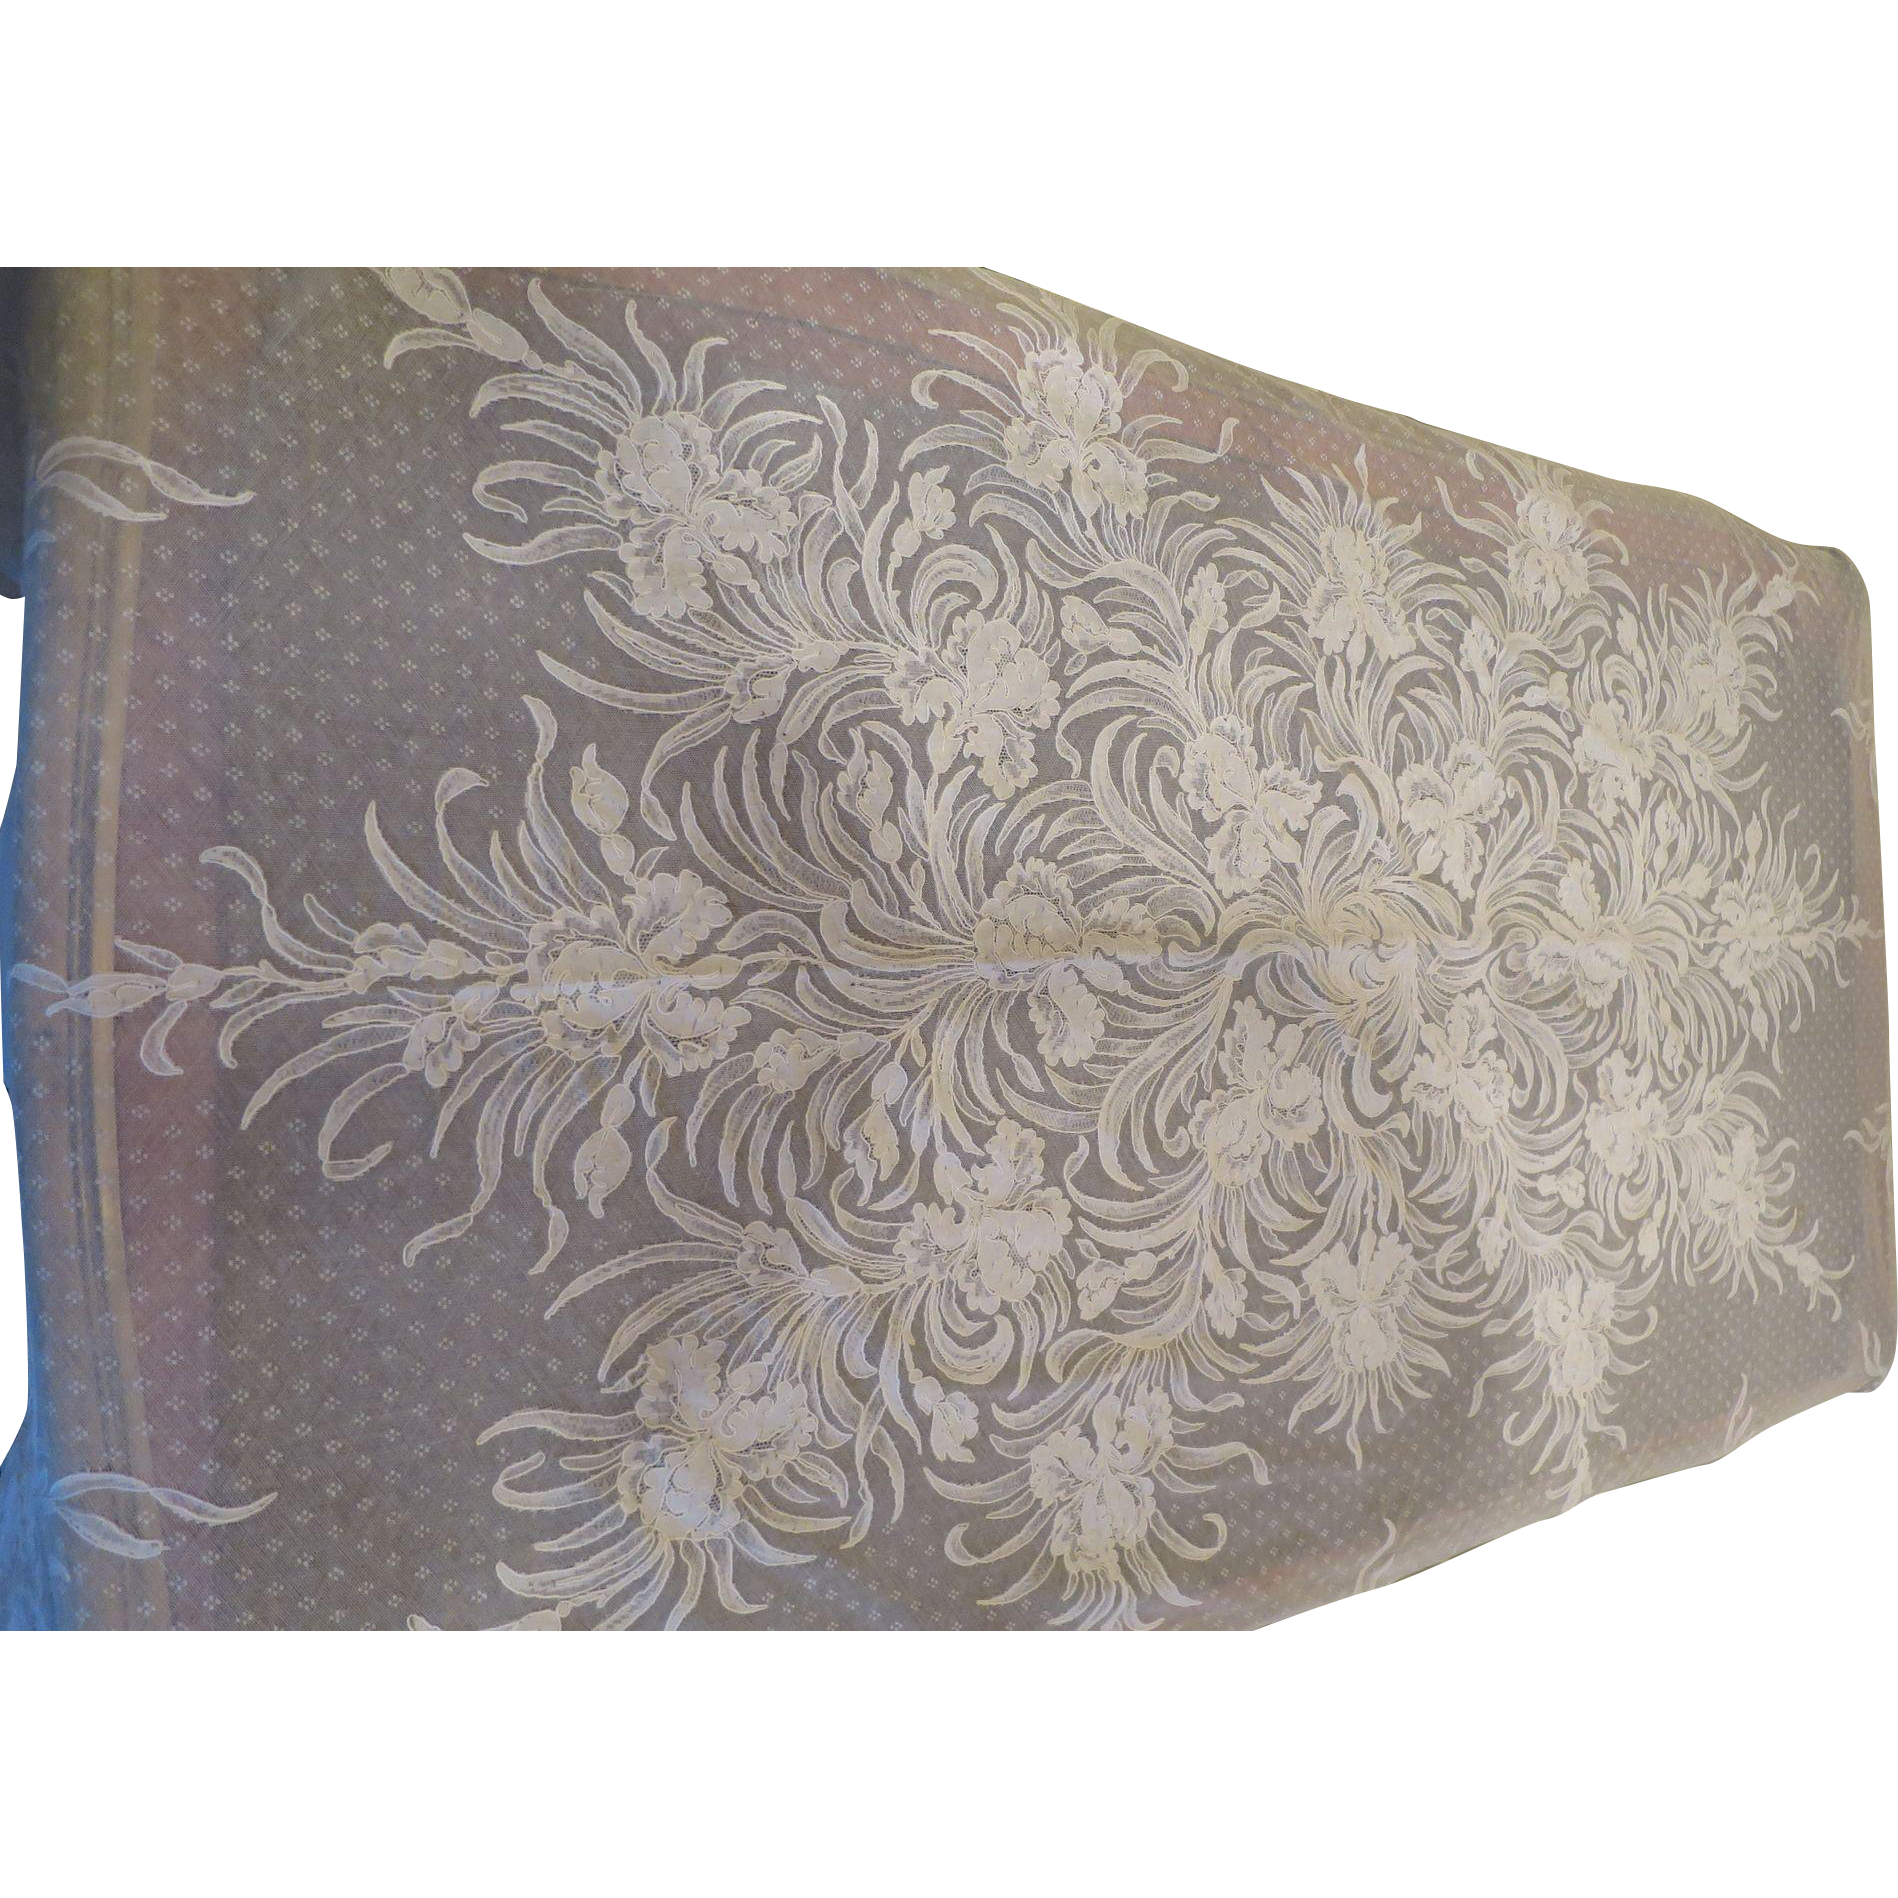 Amazing Alencon Tablecloth and Napkin Set!